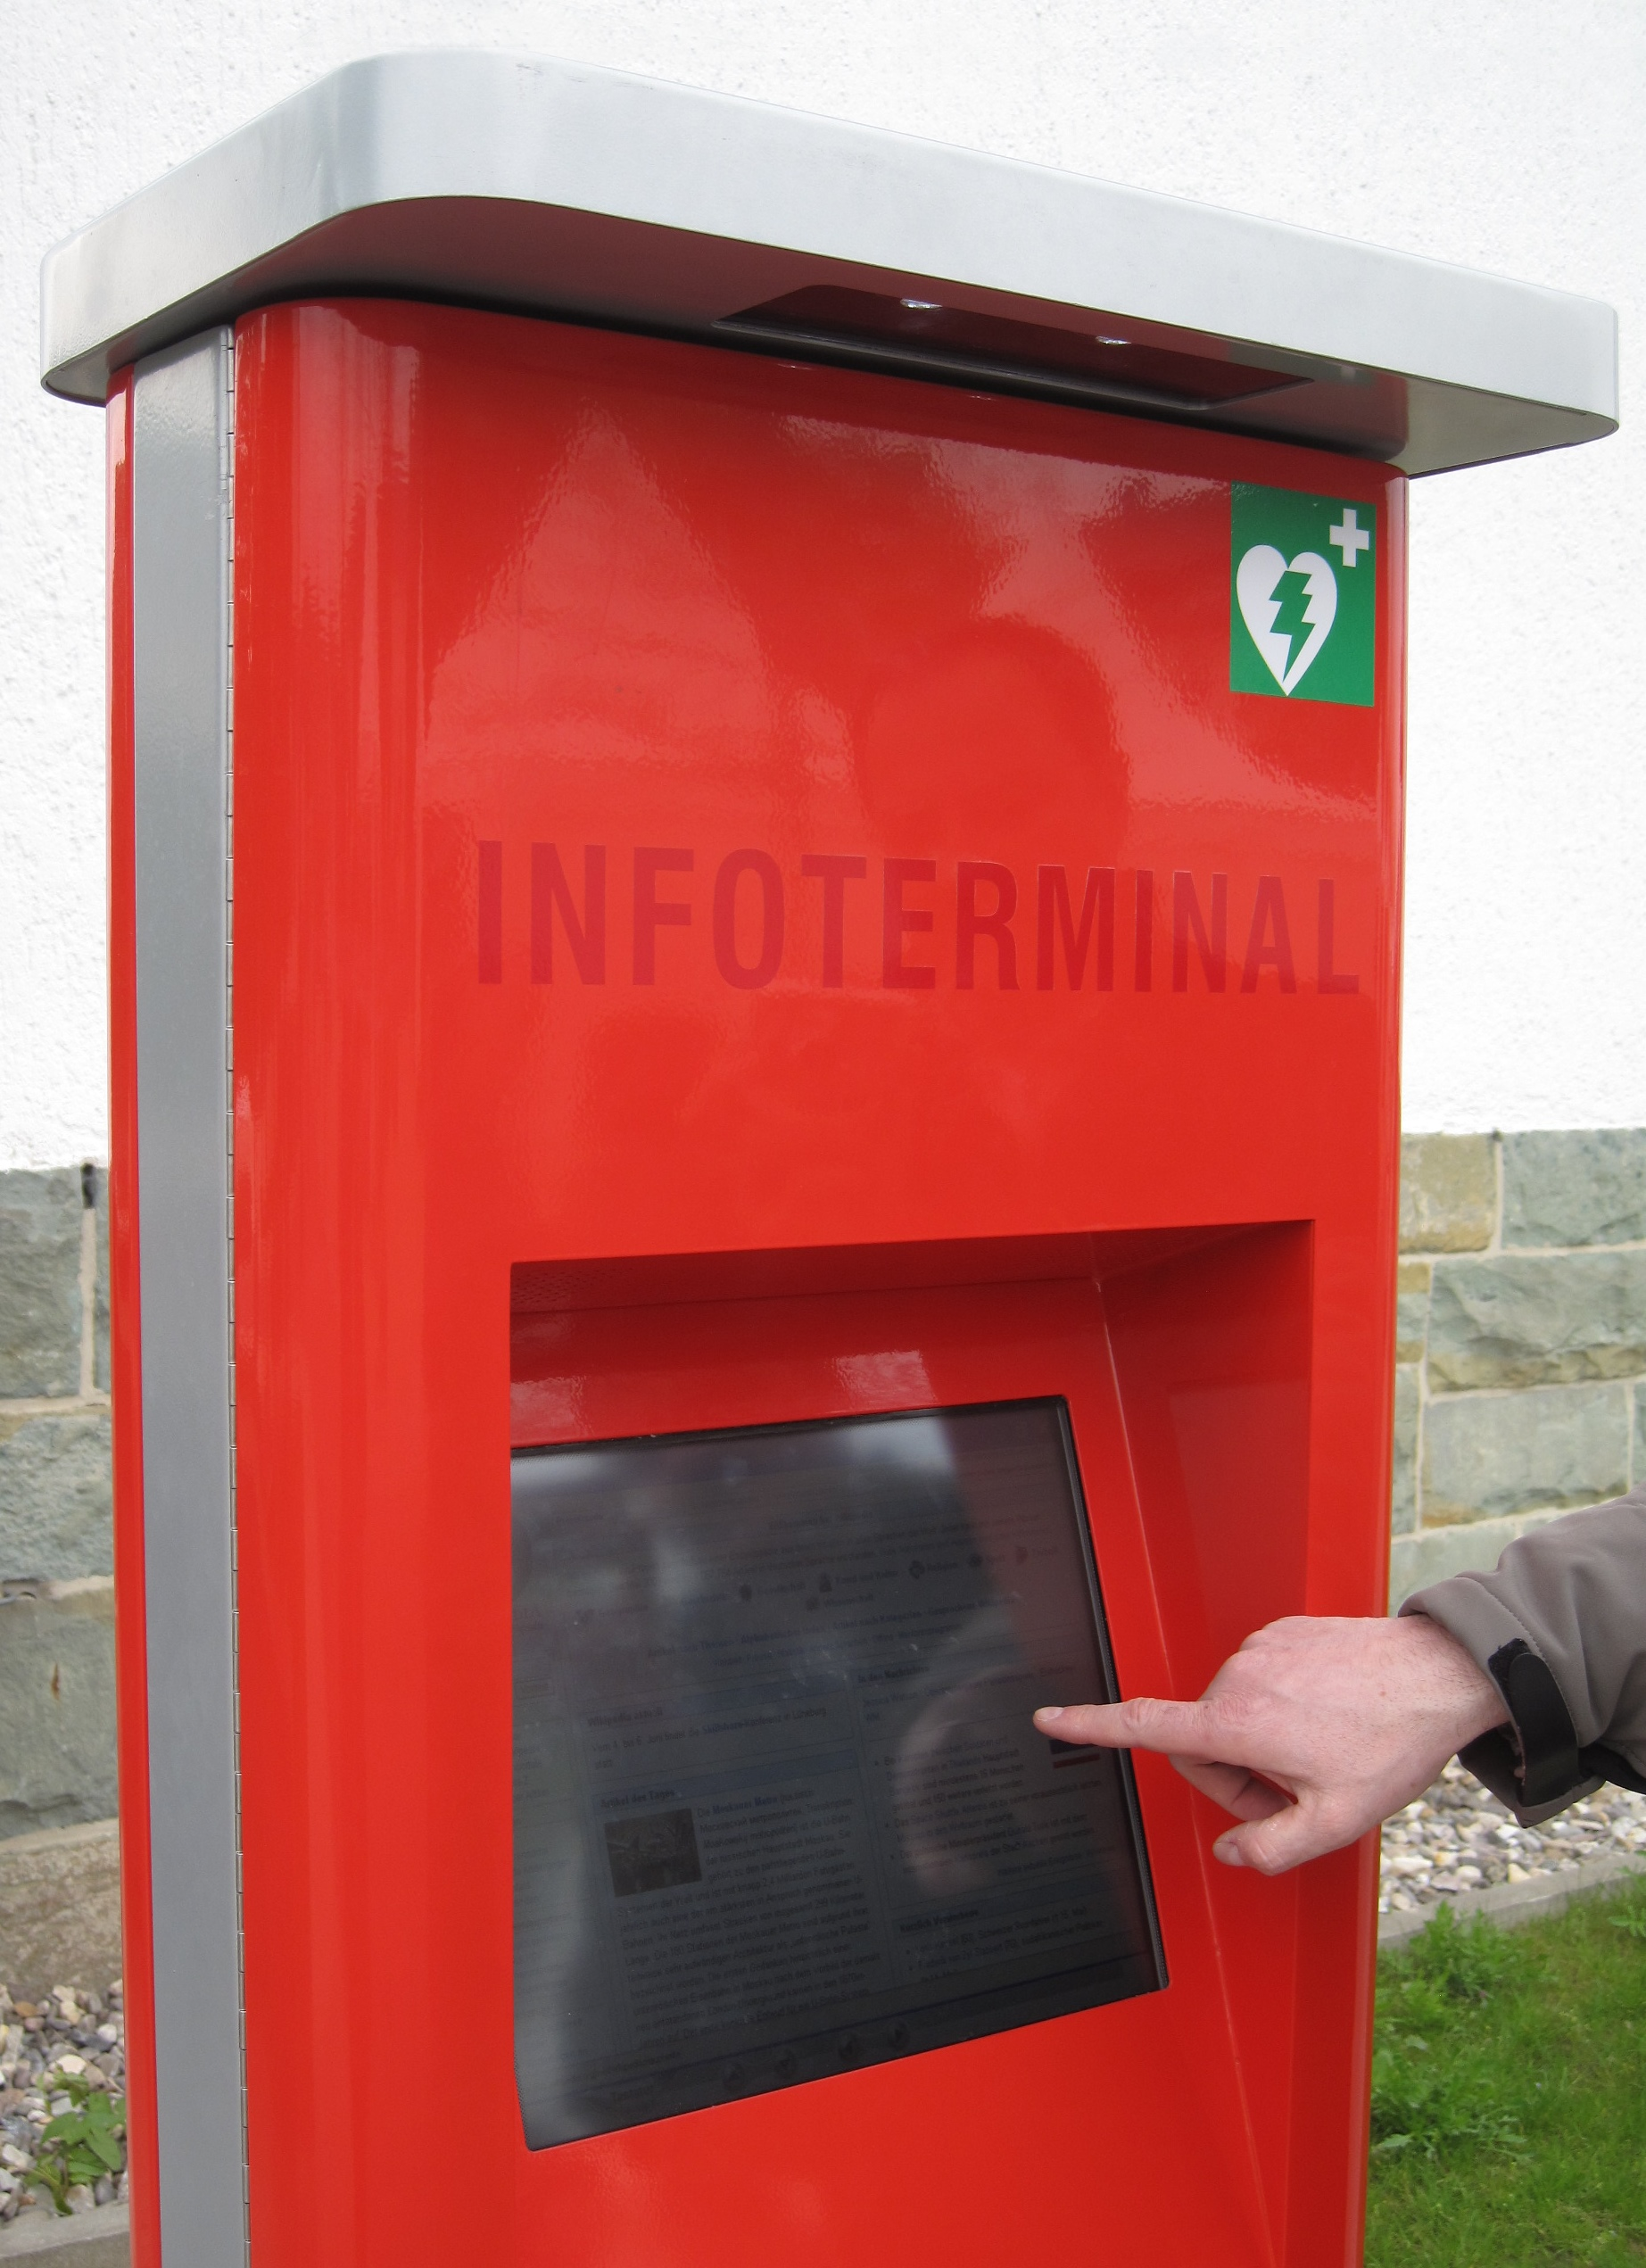 Interactive kiosk - Wikipedia